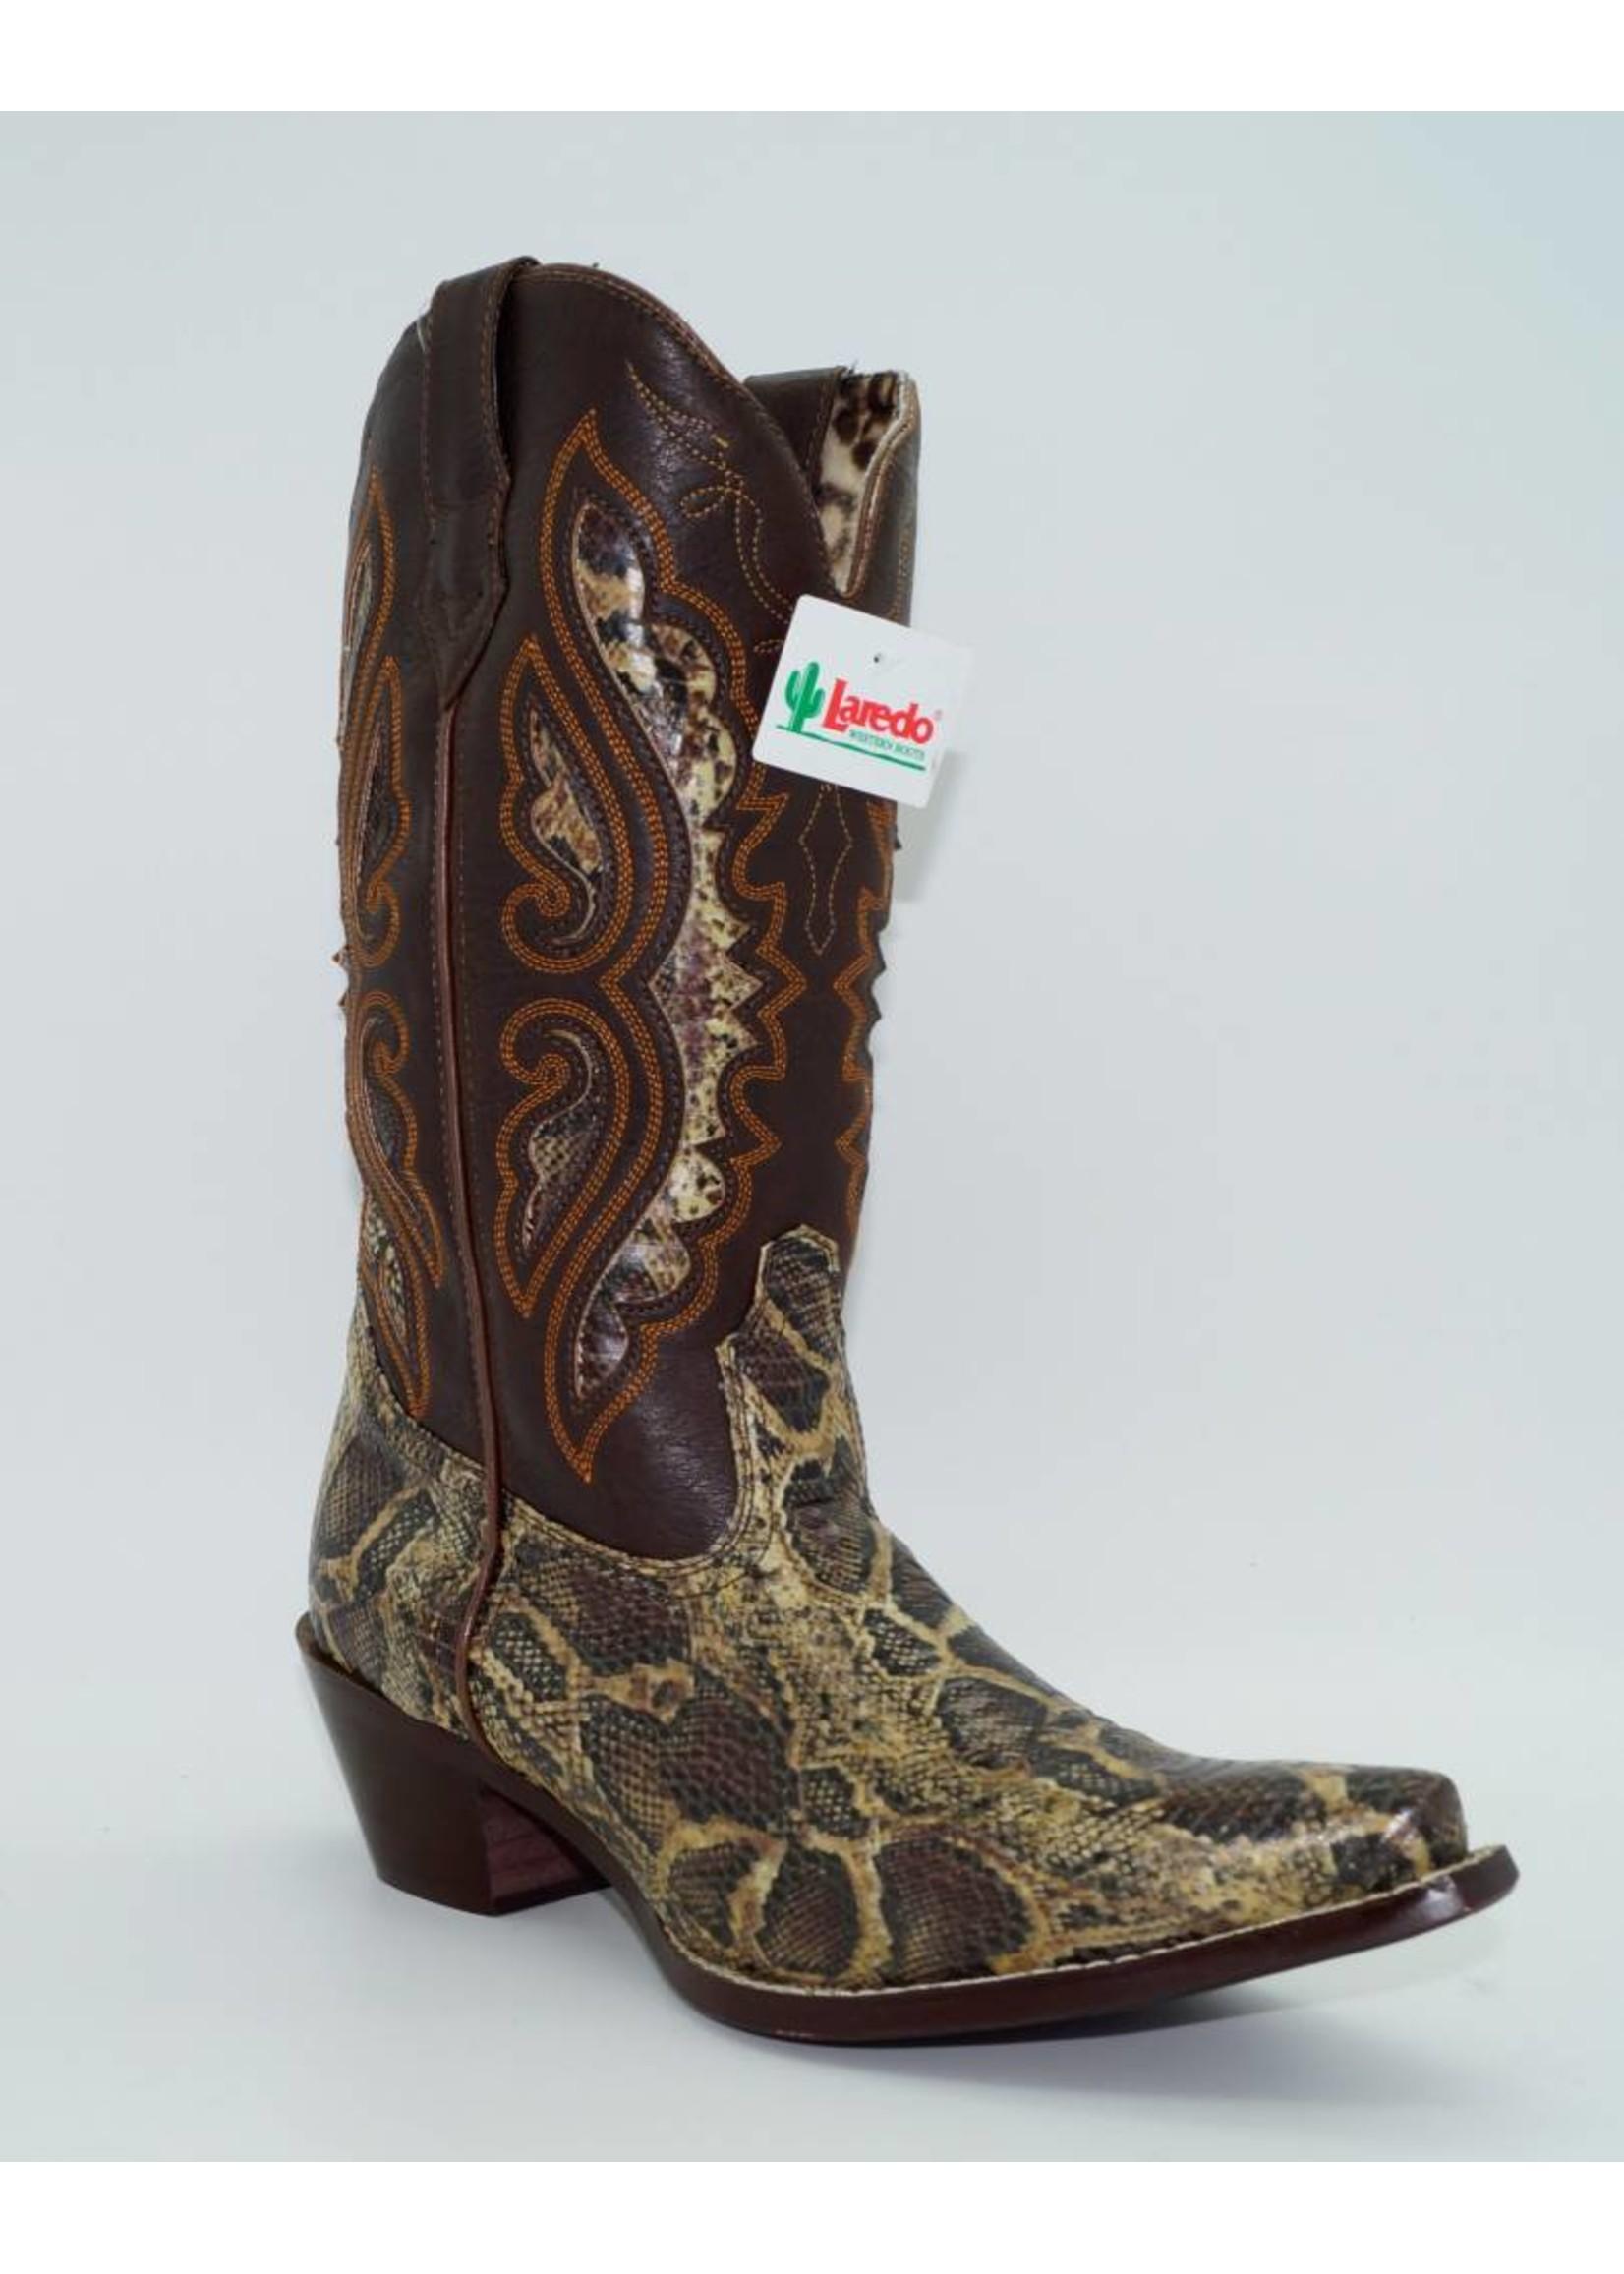 Laredo Women's Genuine Python Snake Skin Boots 5766